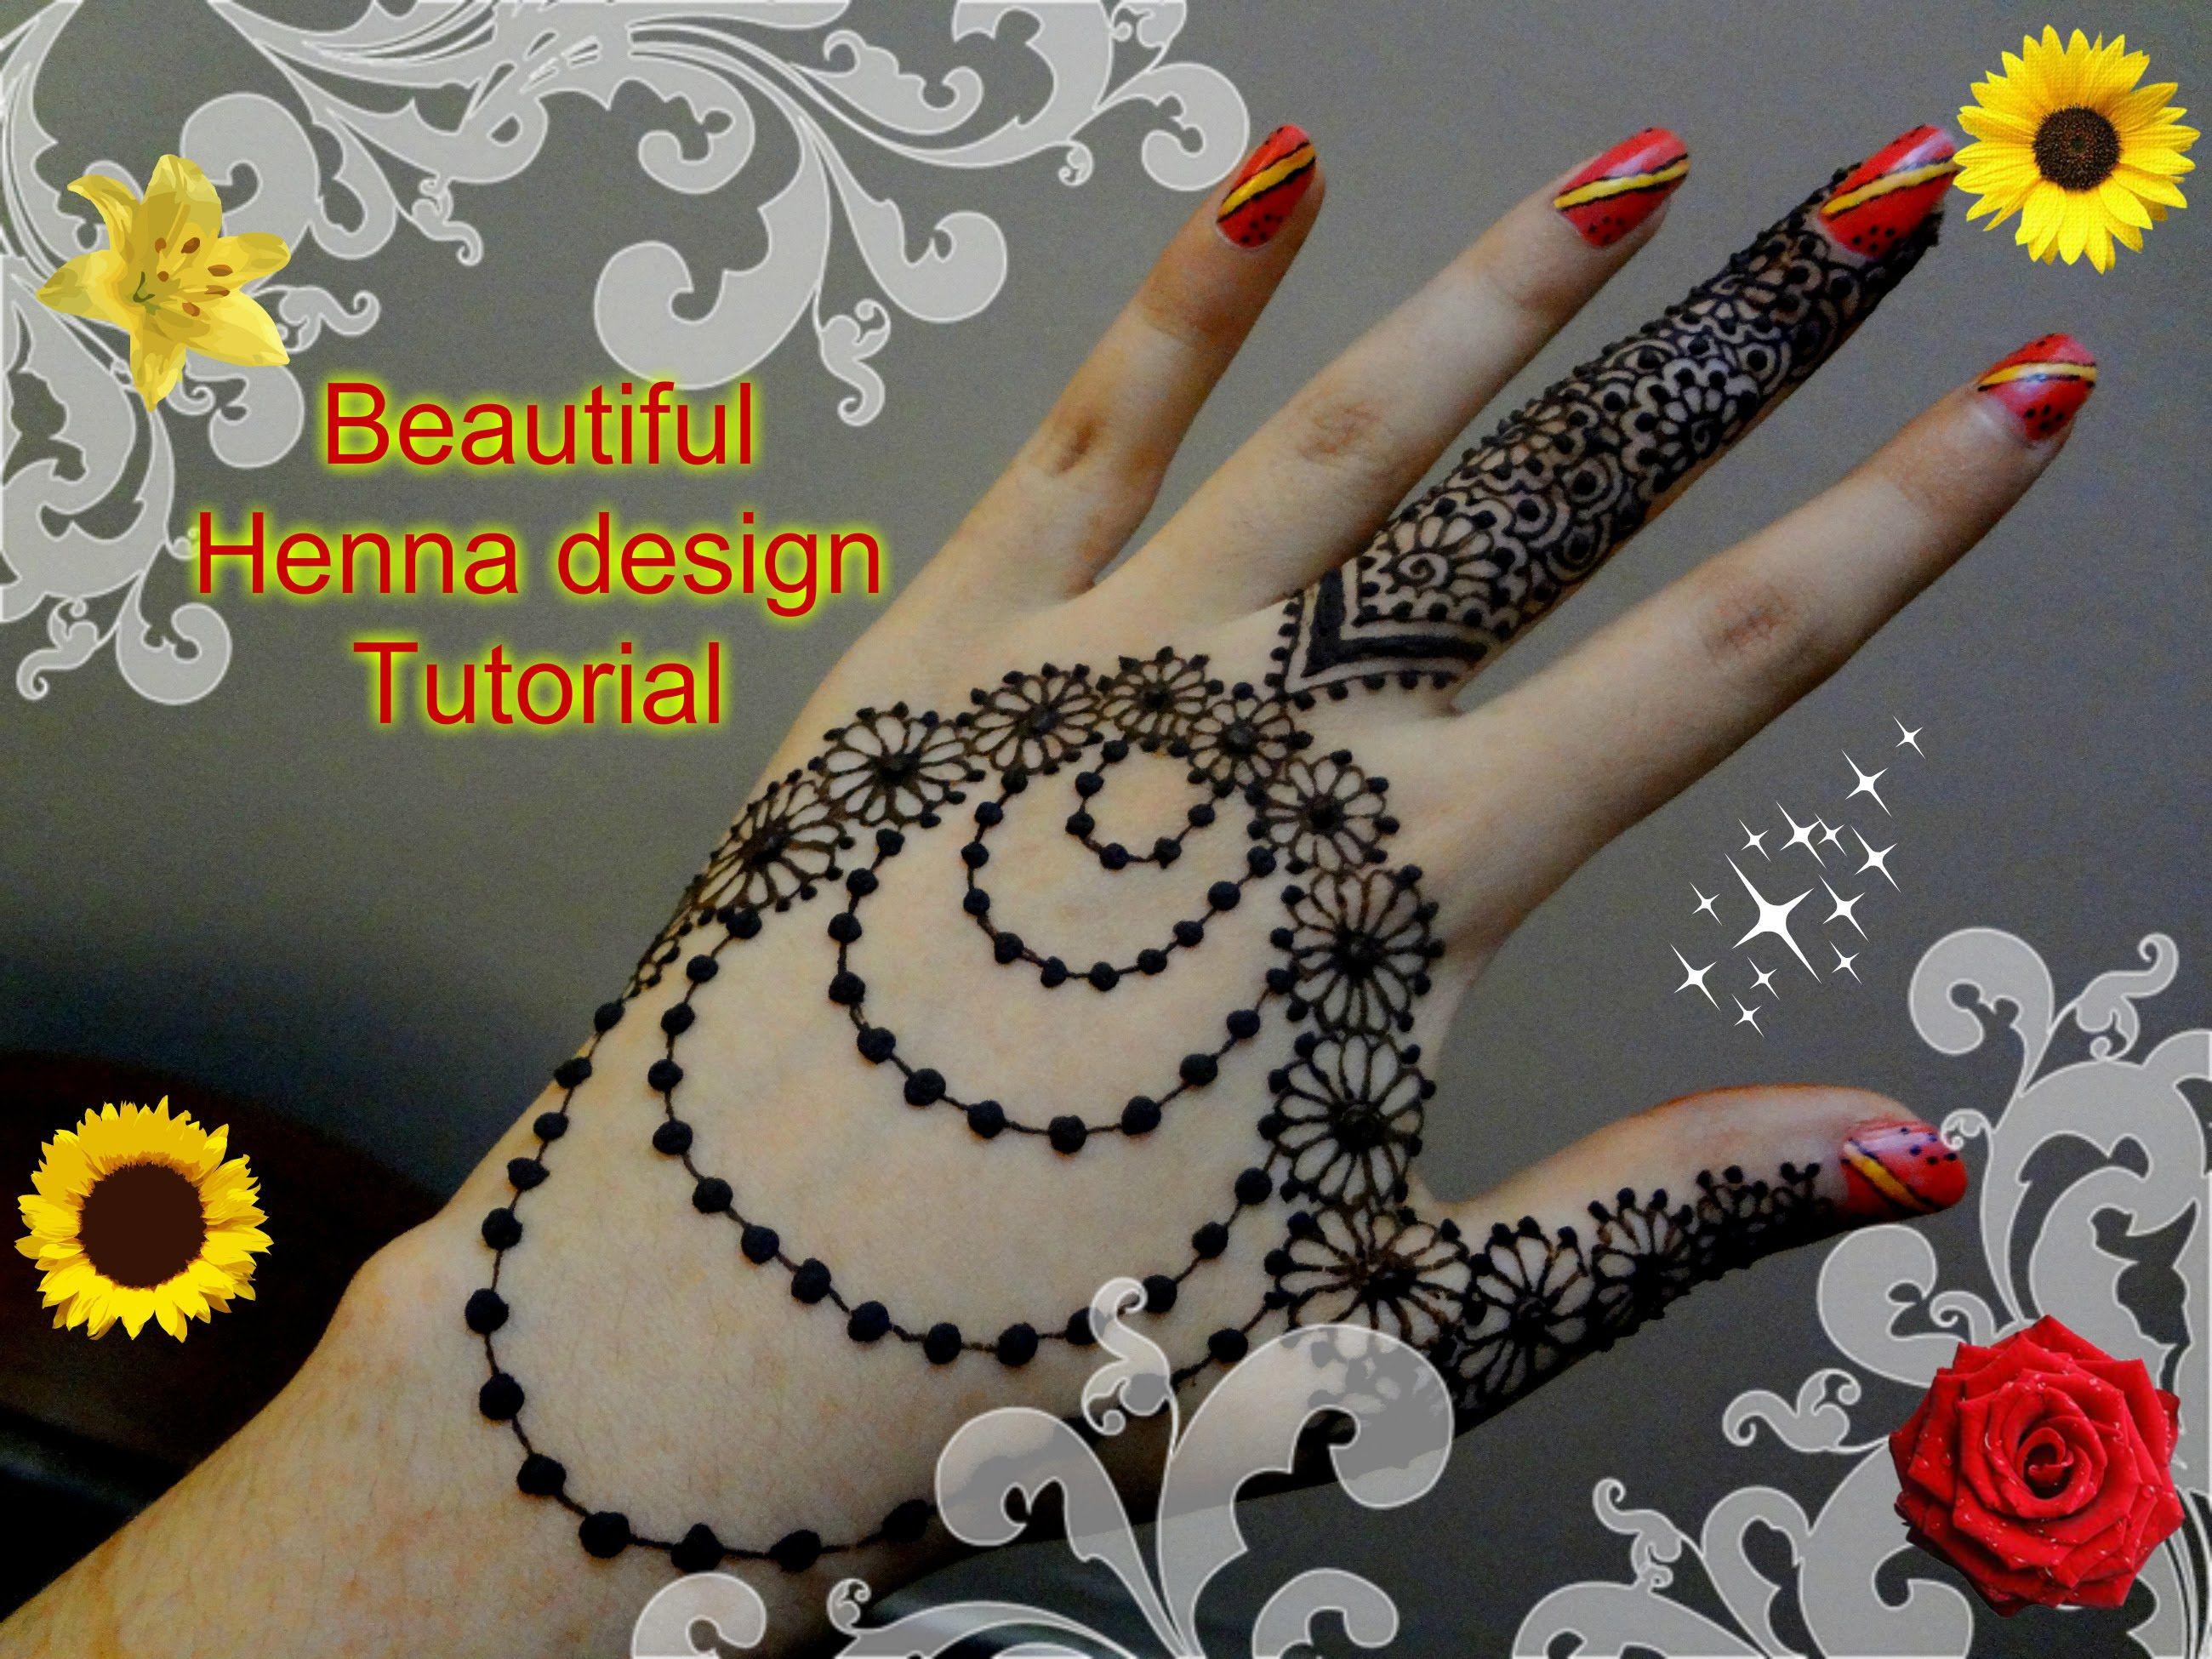 Best And Beautiful Henna Mehndi Jewellery Inspired Design Tutorial For Eid Mehndi Designs Beautiful Henna Designs Henna Mehndi